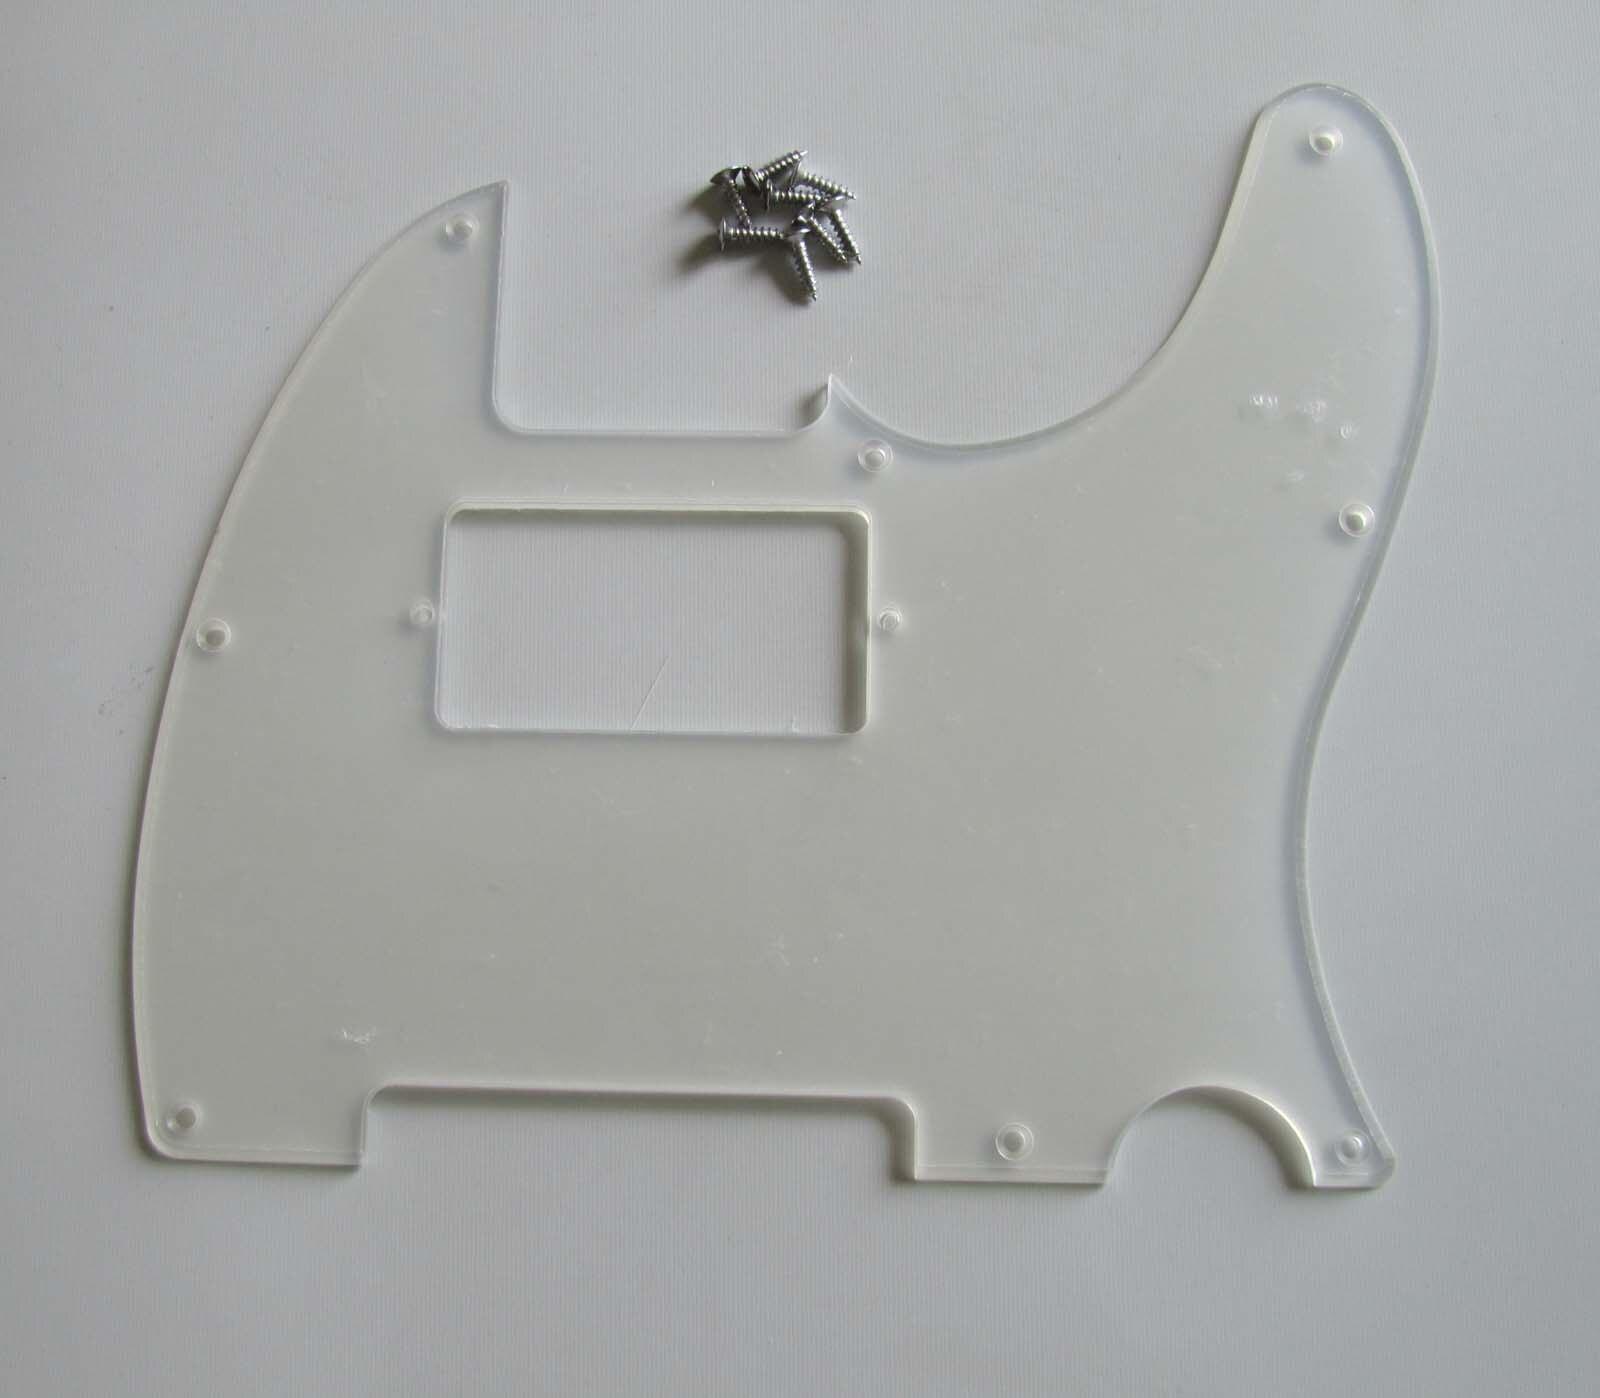 KAISH Transparent TL Humbucker Guitar Pickguard Clear Scratch Plate